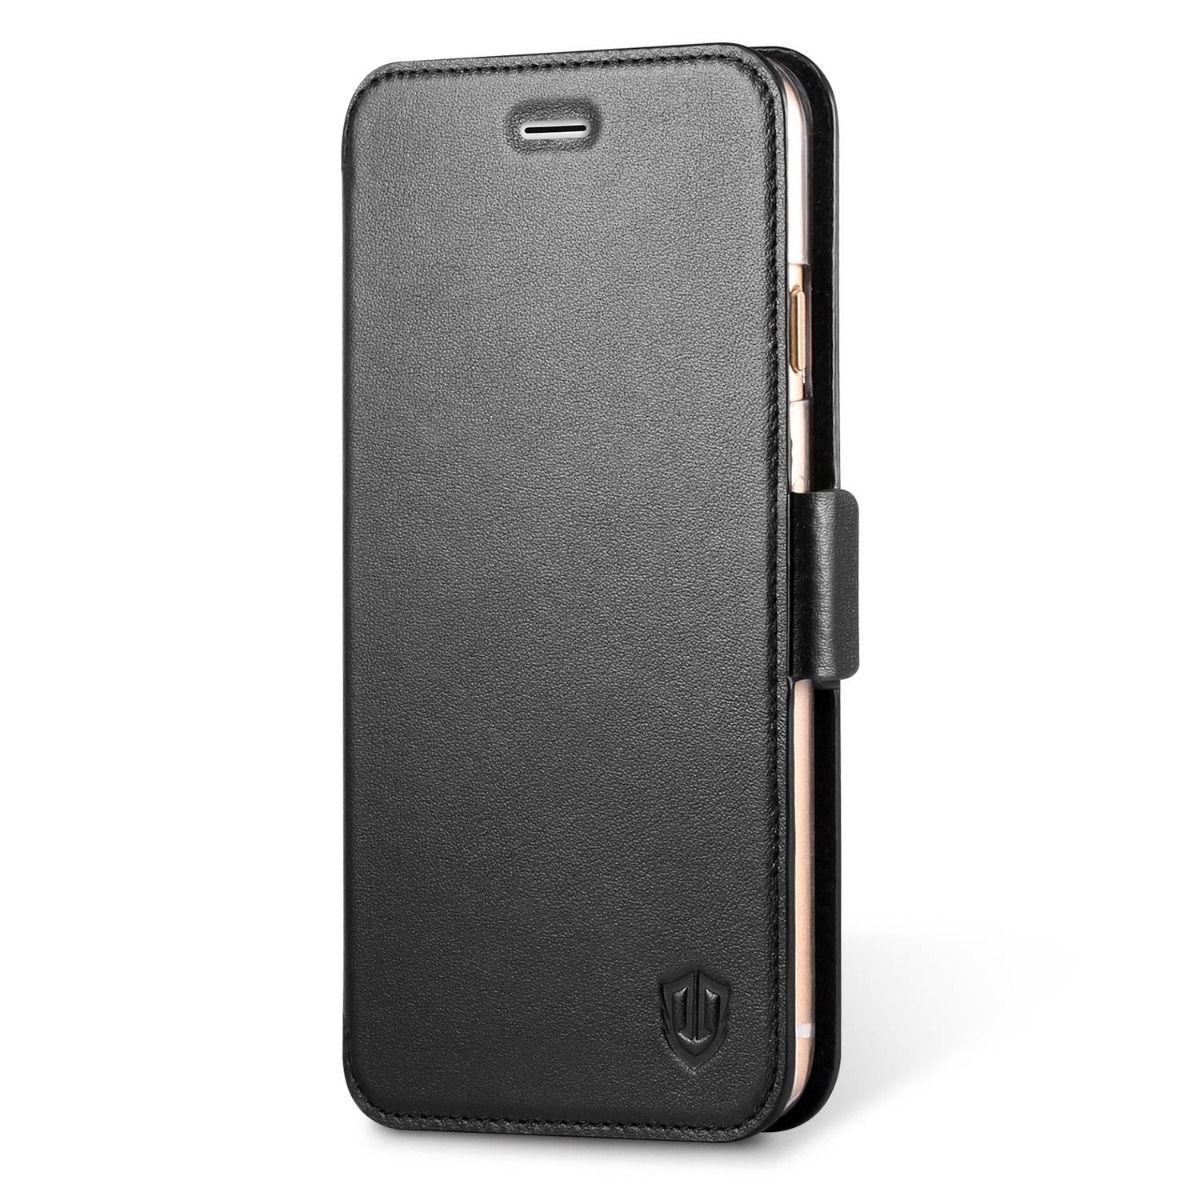 Get Modern Iphone  Plus Case